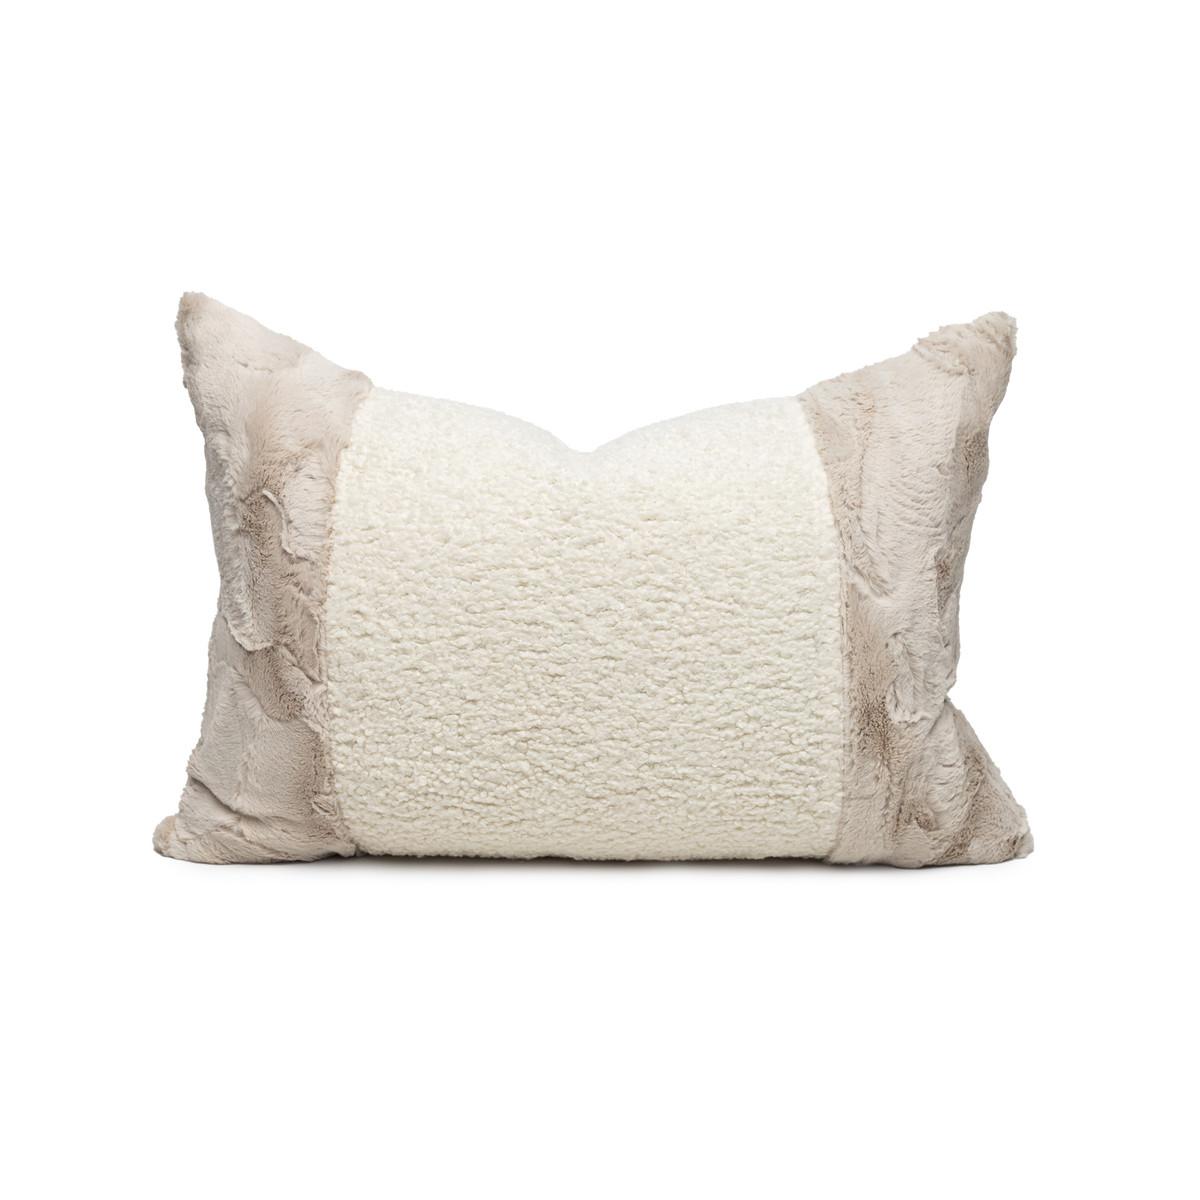 Sacha Vegan Faux Sherpa Fur Washable Pillow - Front